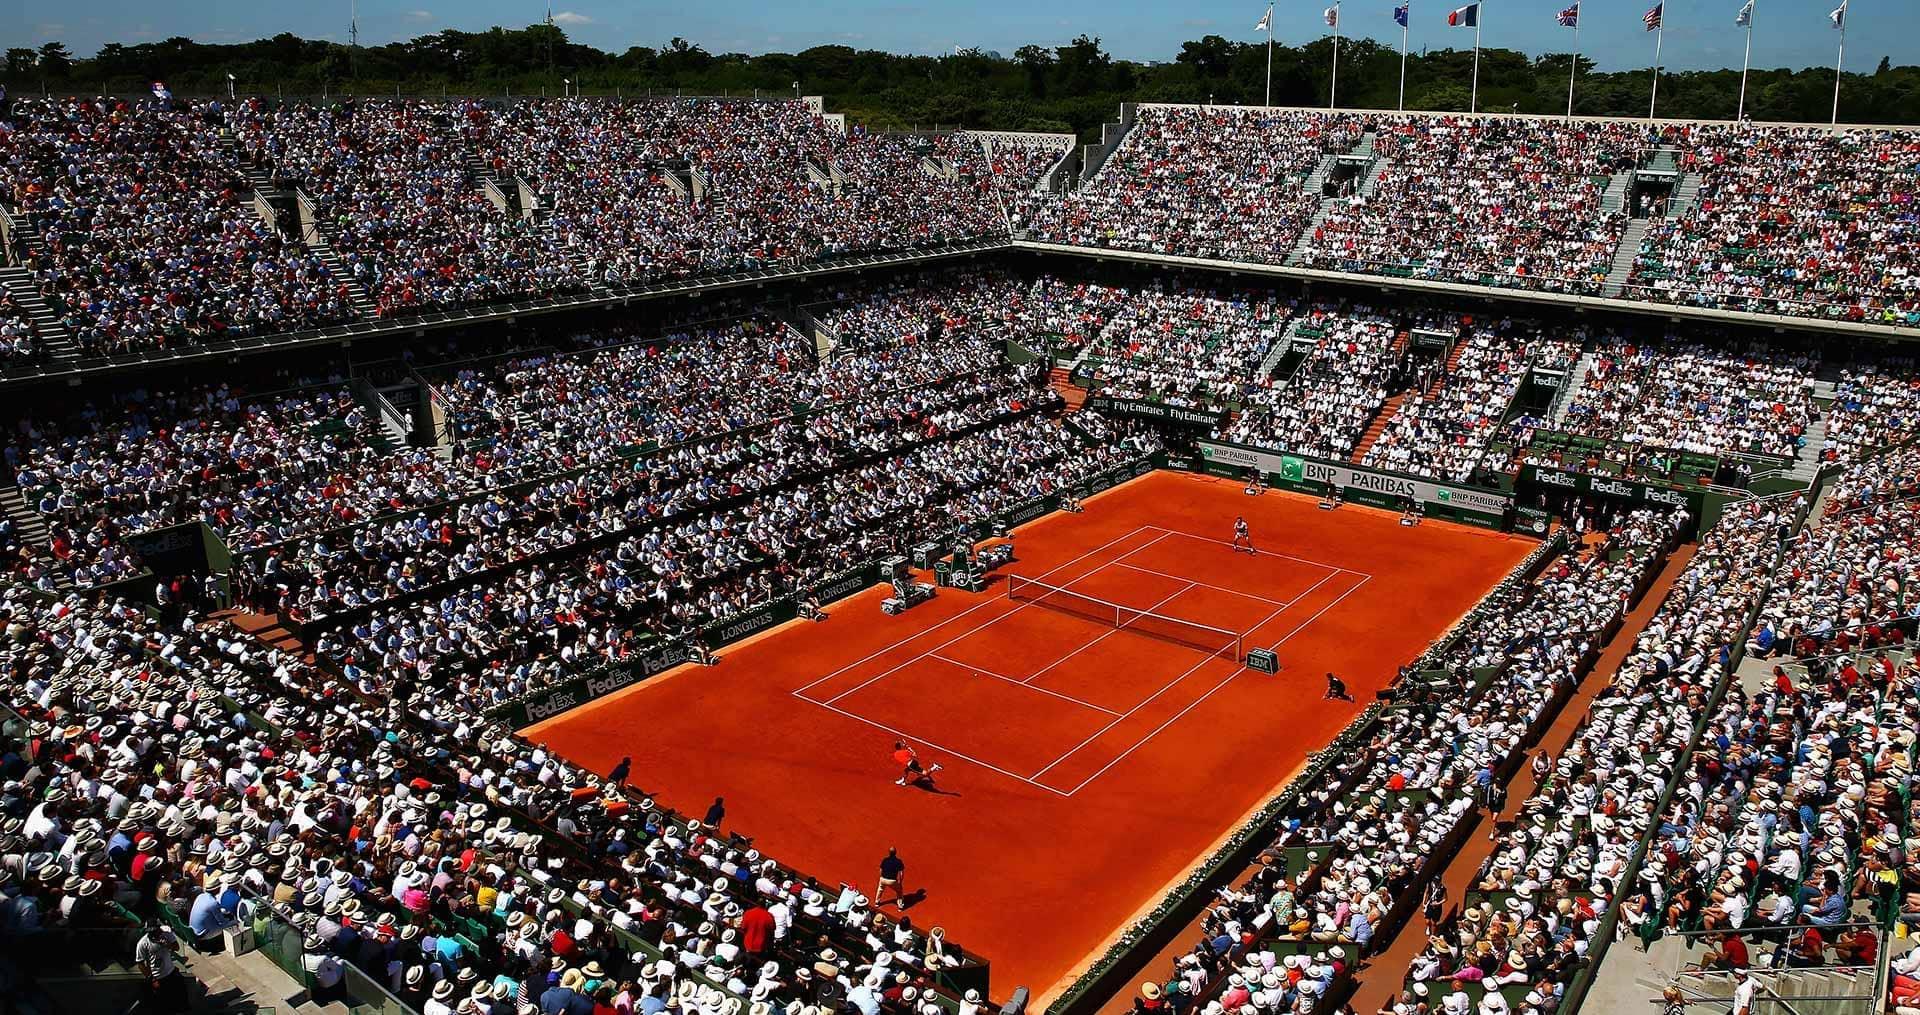 Roland Garros Location In Paris Map.Roland Garros Overview Atp Tour Tennis